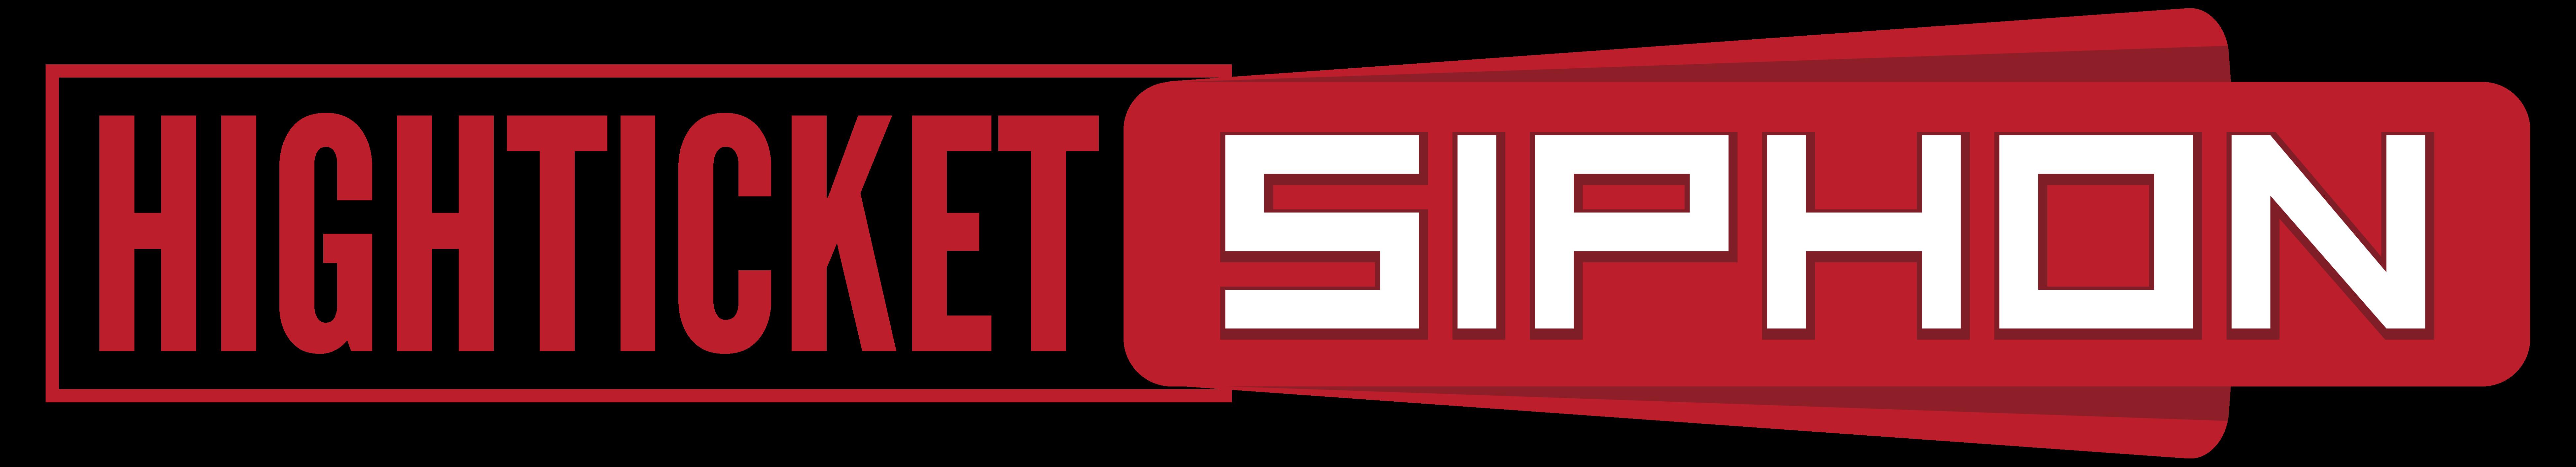 high ticket siphon logo